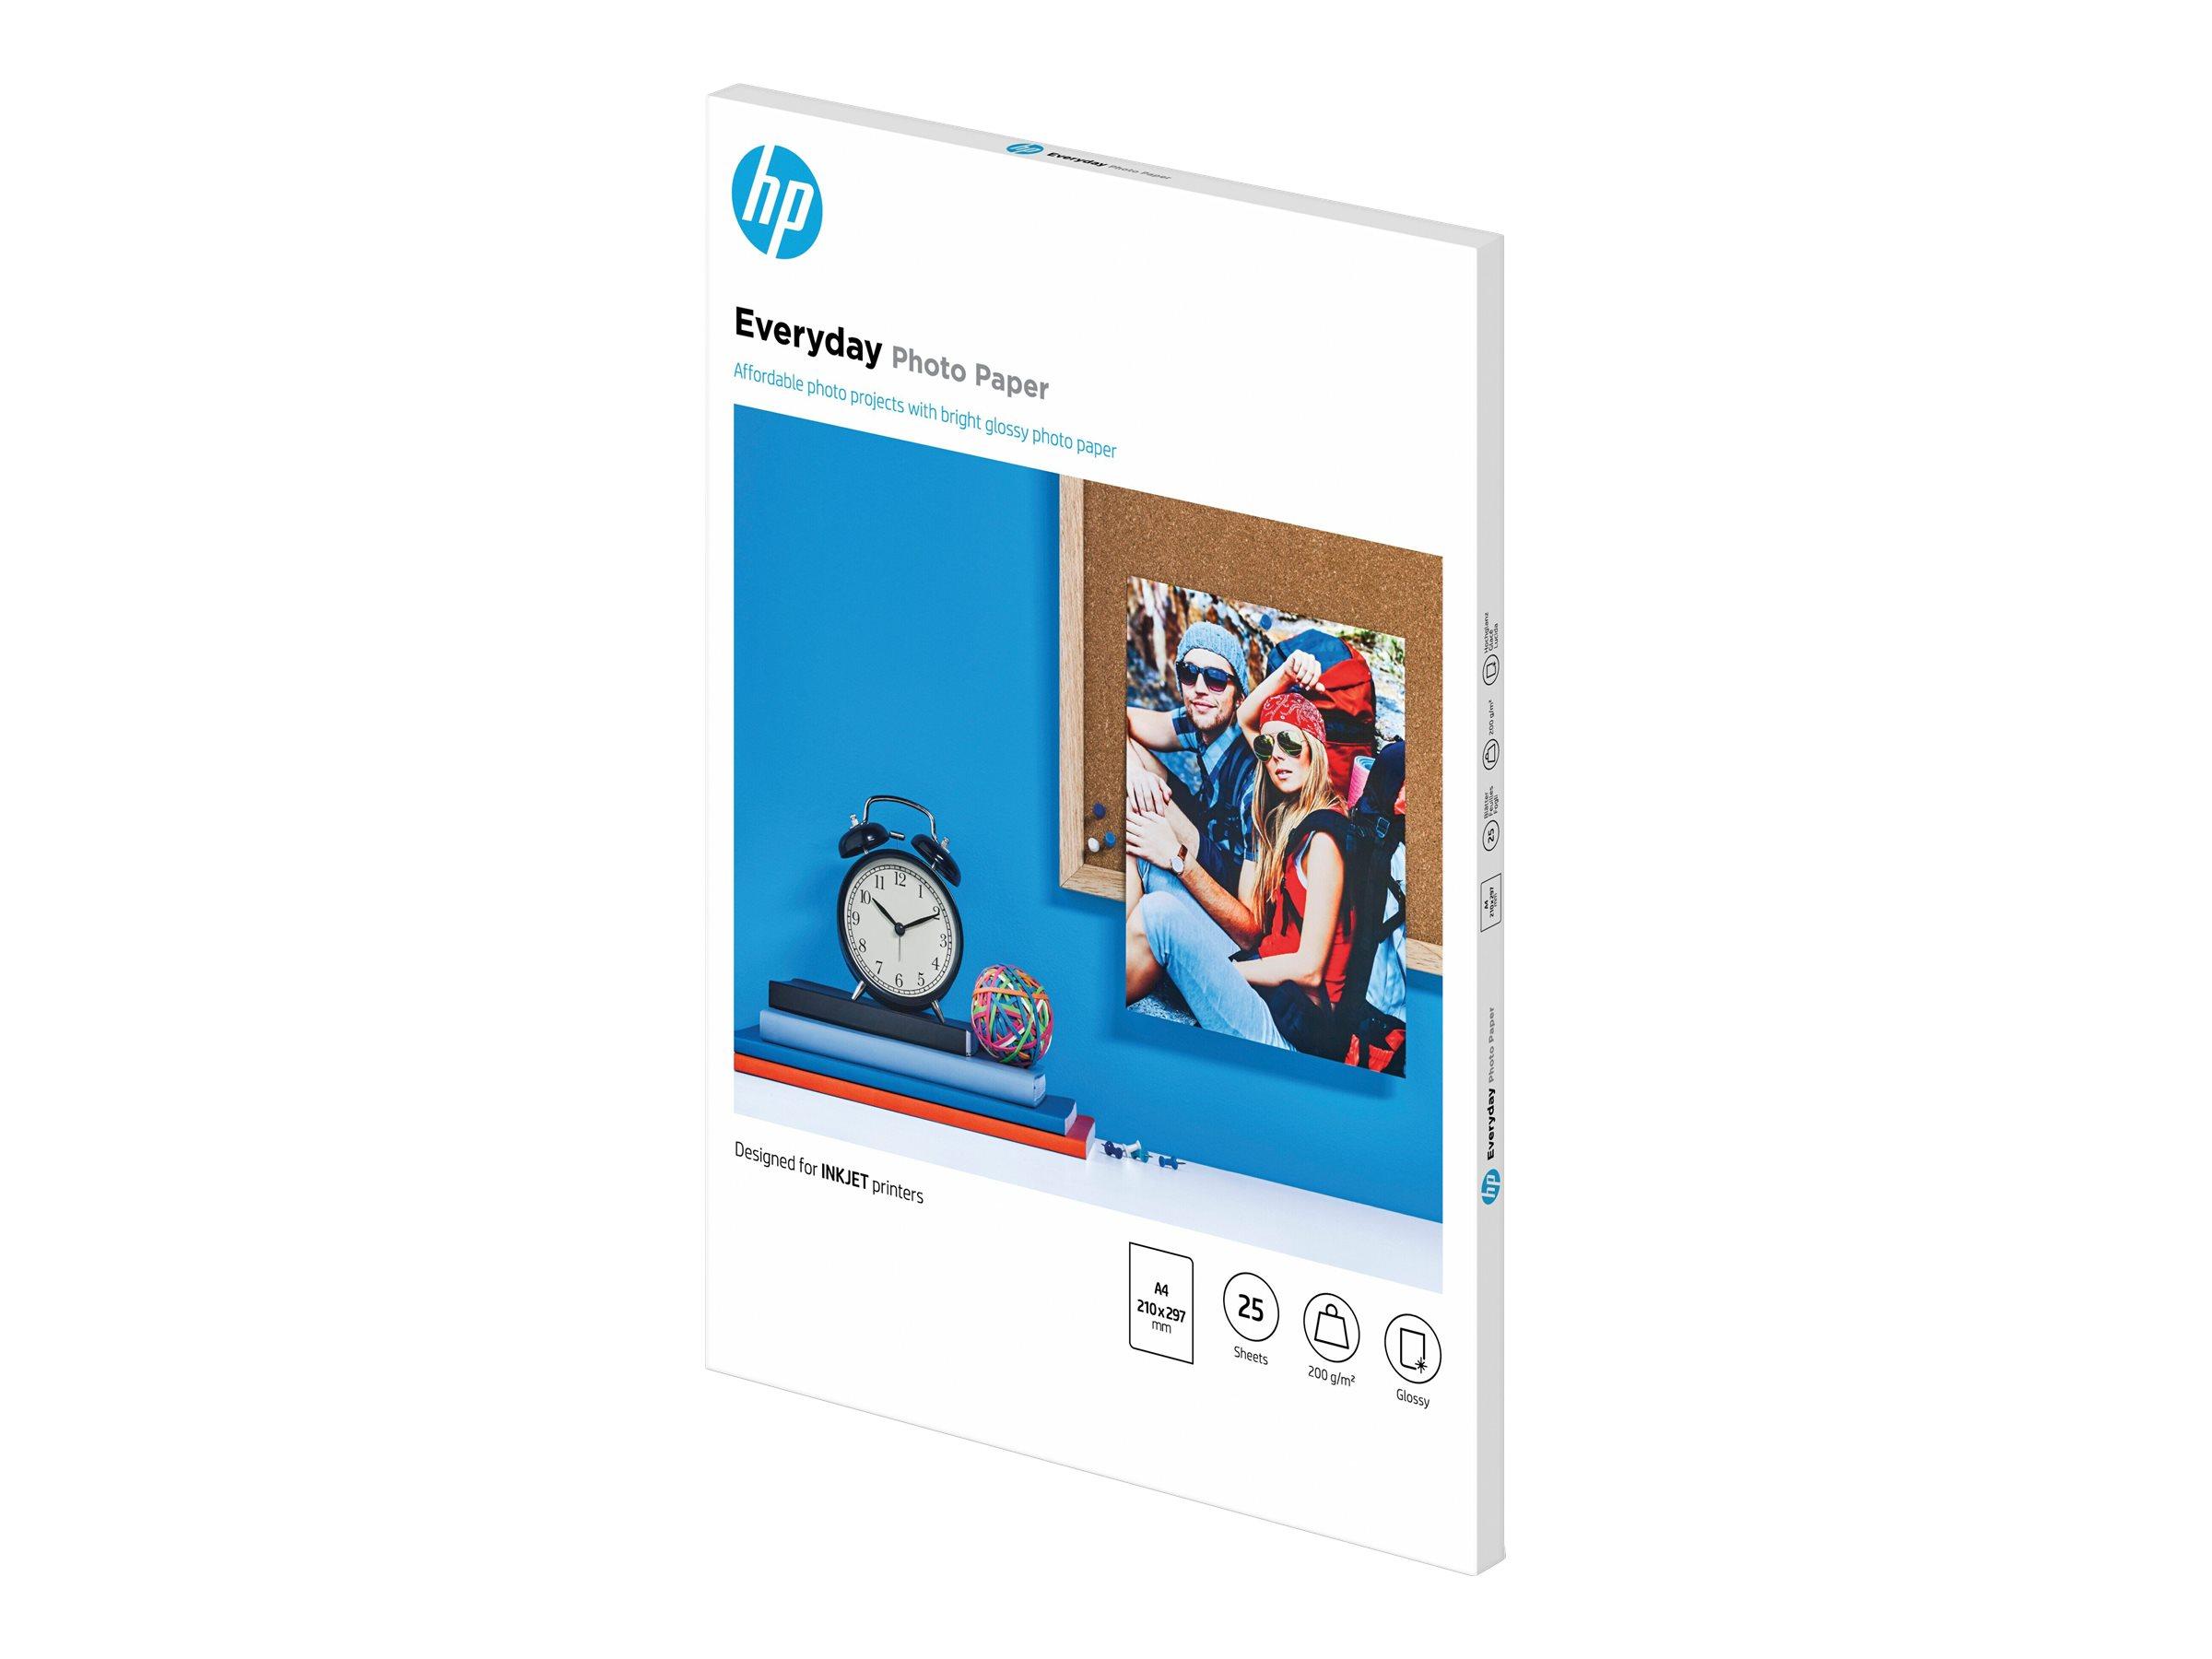 HP Everyday Photo Paper - Glänzend - 8 mil - A4 (210 x 297 mm) - 200 g/m² - 25 Blatt Fotopapier